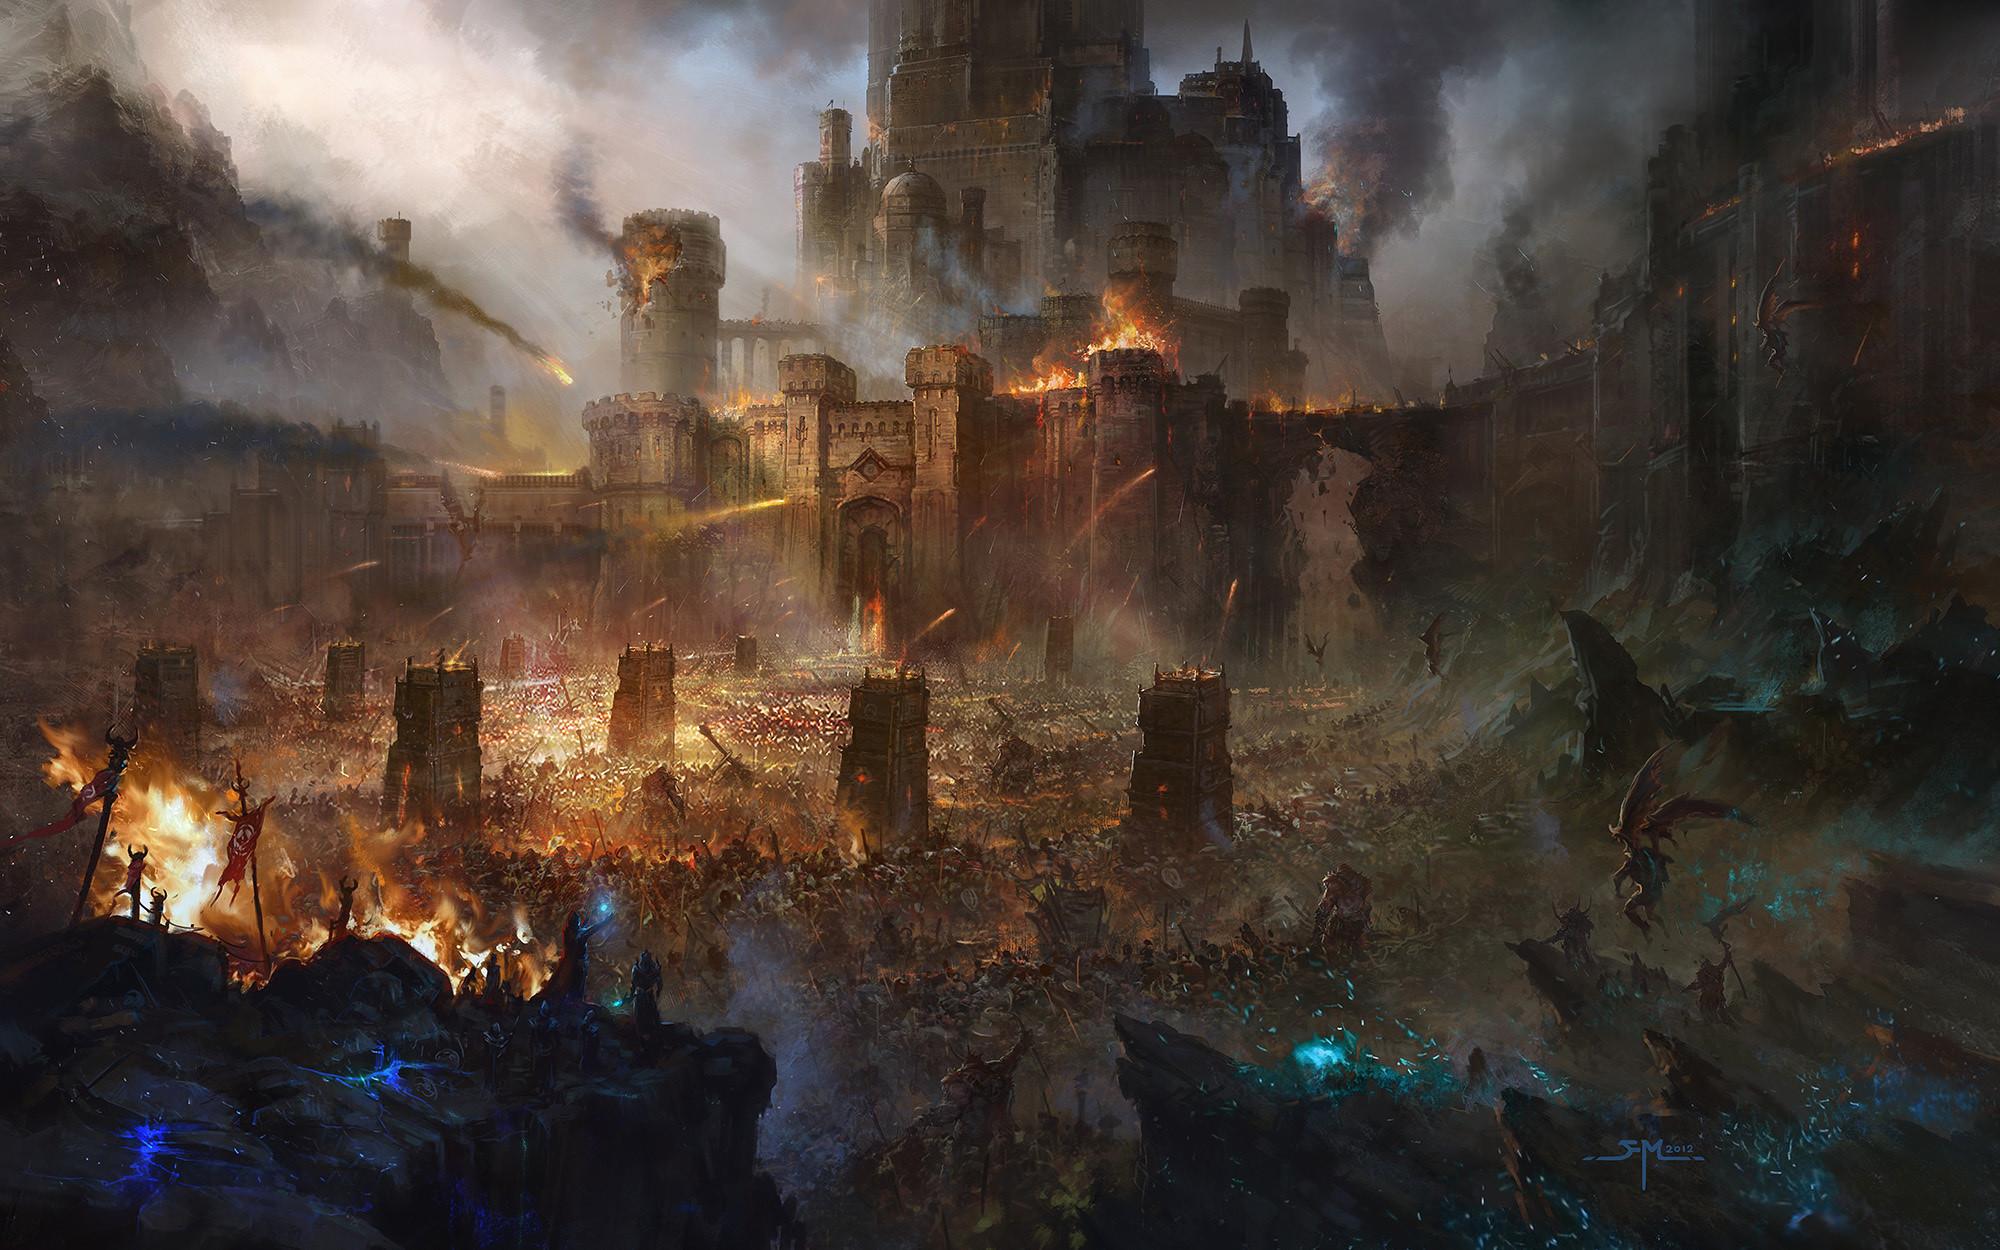 Desktop Wallpaper Tolkien Quote Lotr Backgrounds 77 Pictures